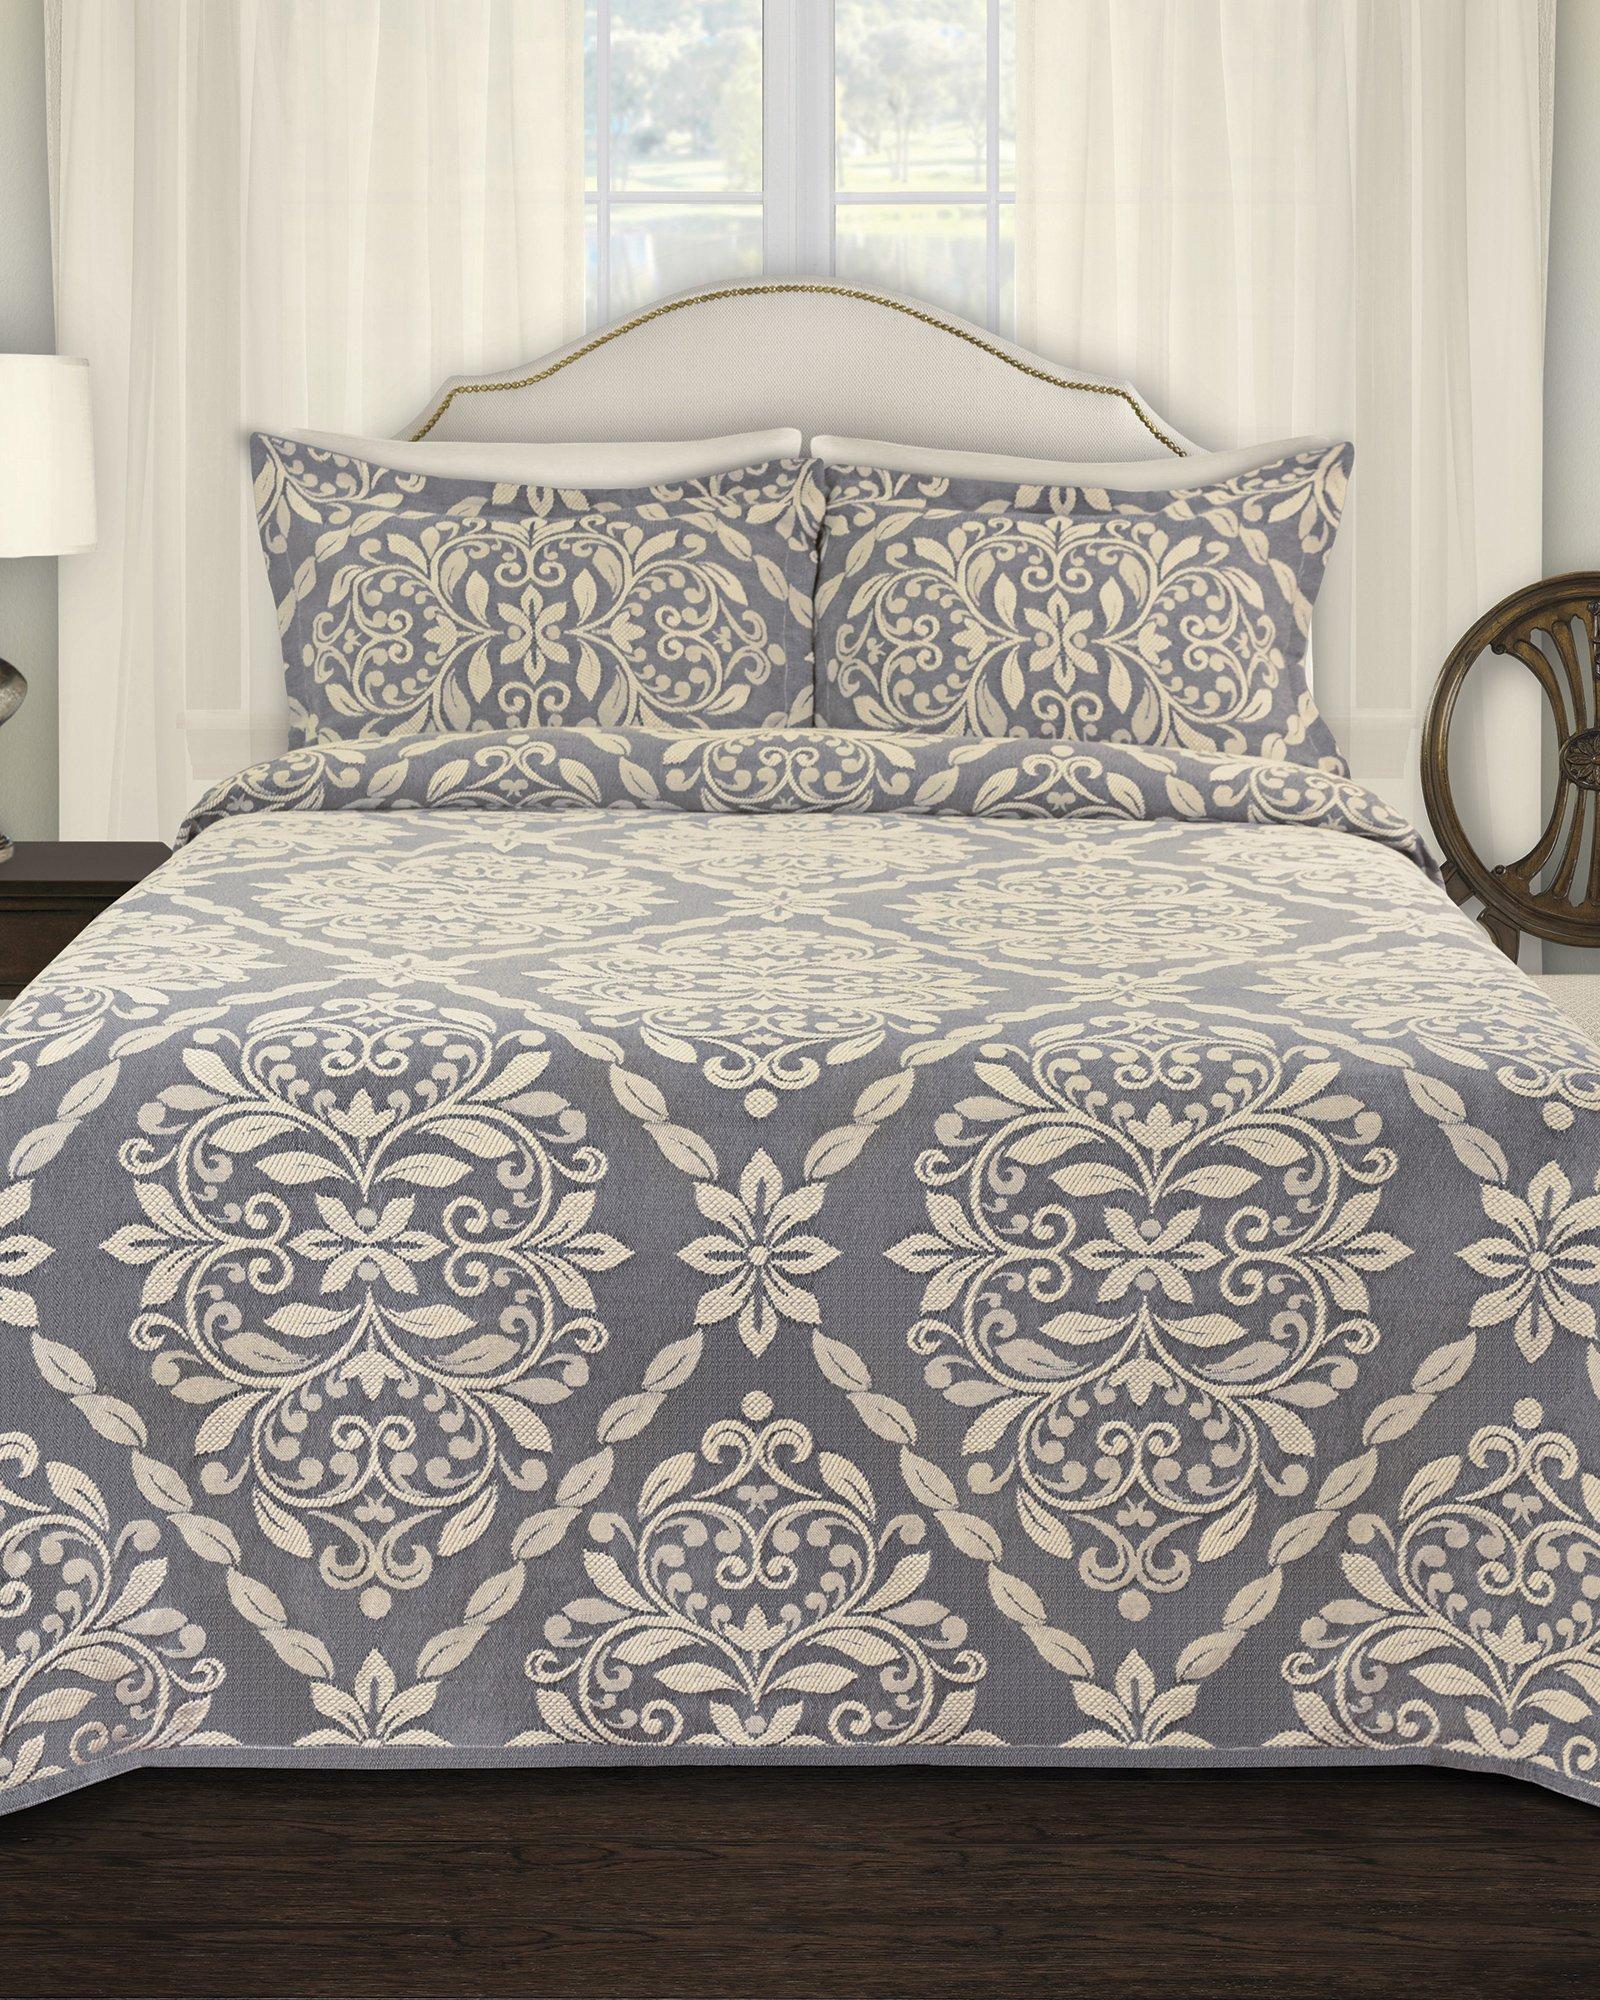 LaMont Home LBBD9410140 Georgio Bedspread, Twin, Denim